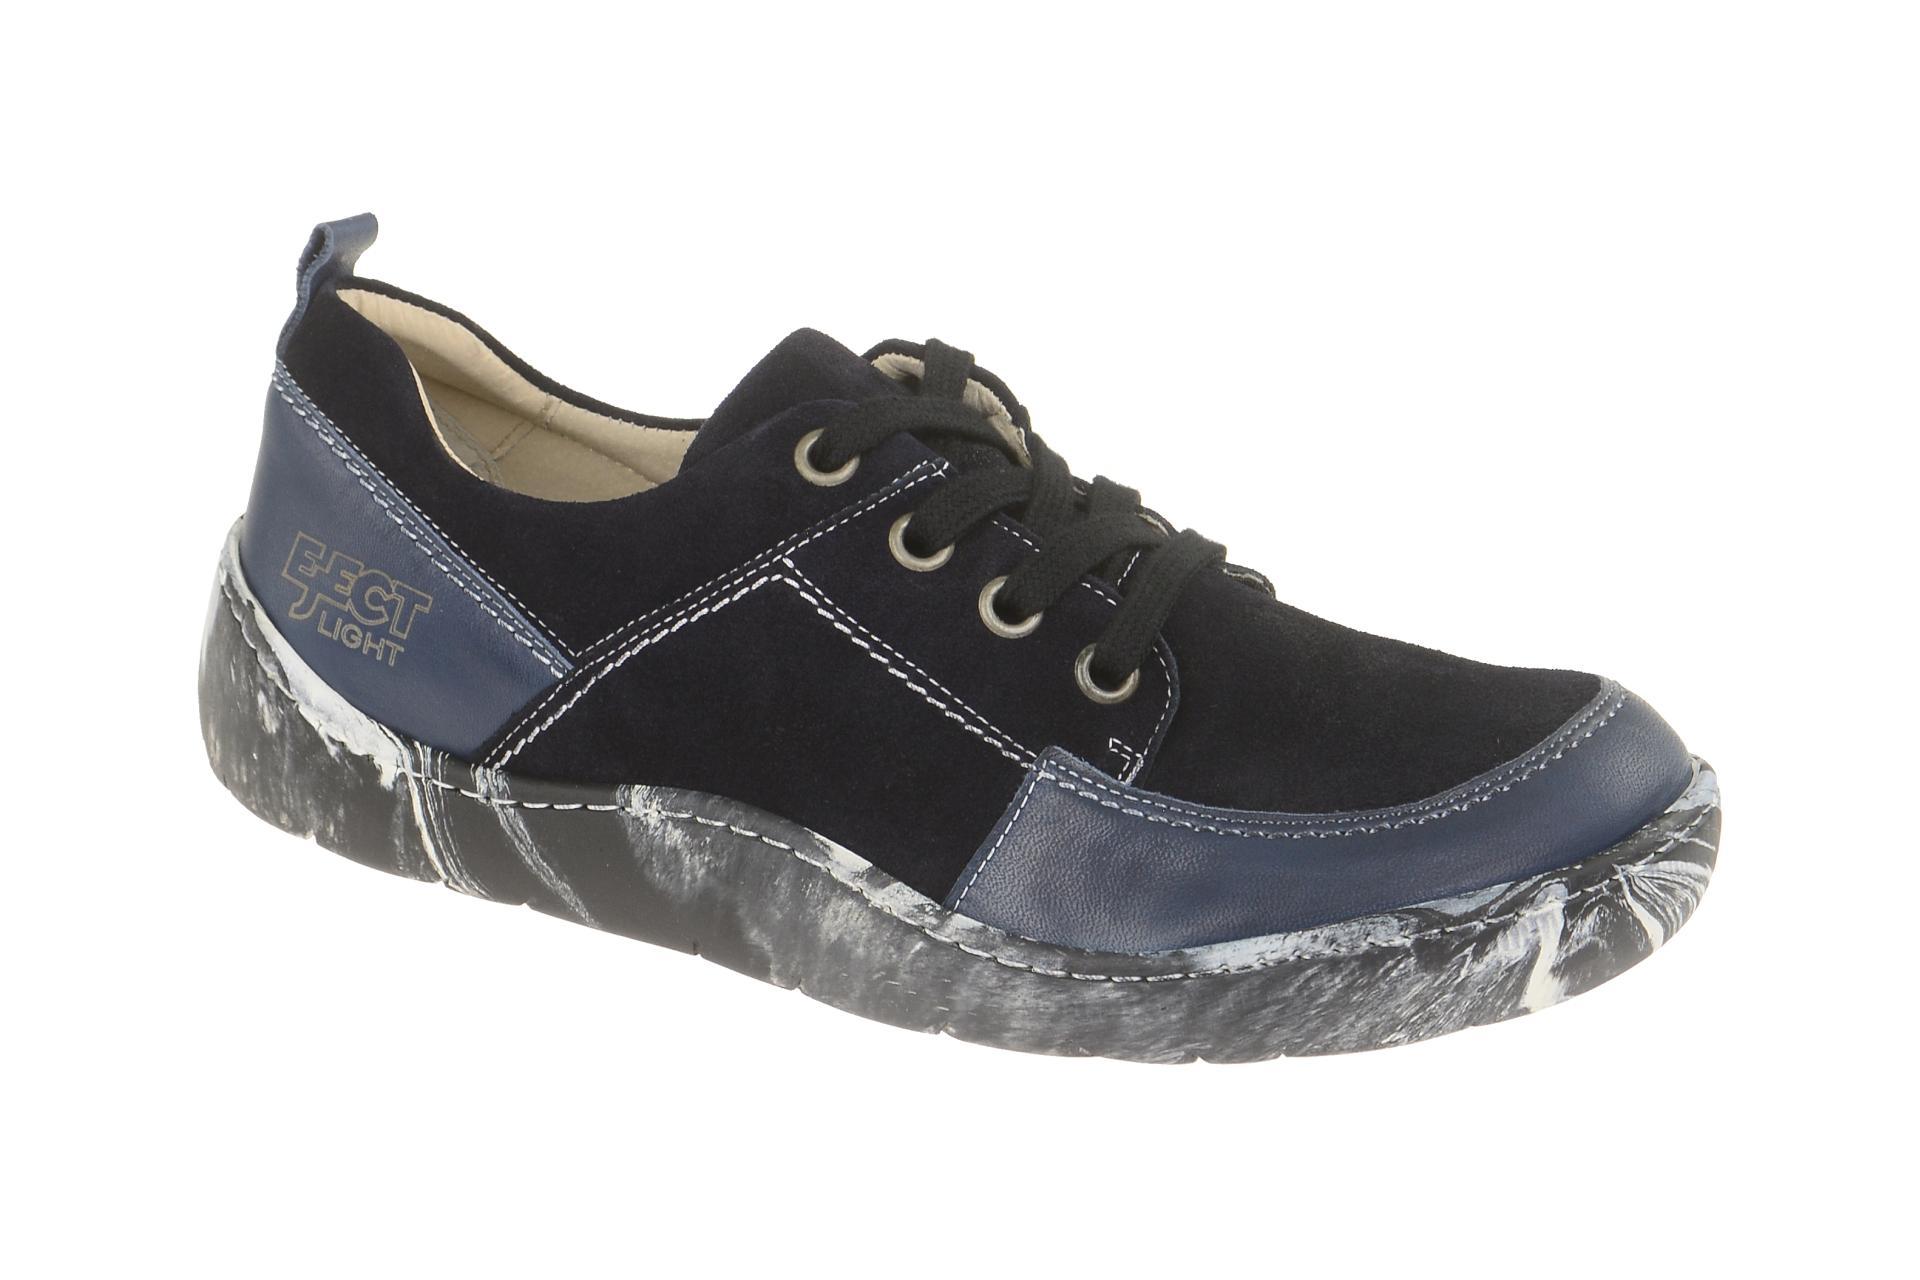 Eject Schuhe OCEAN blau Herrenschuhe sportliche Halbschuhe 17916.006 NEU